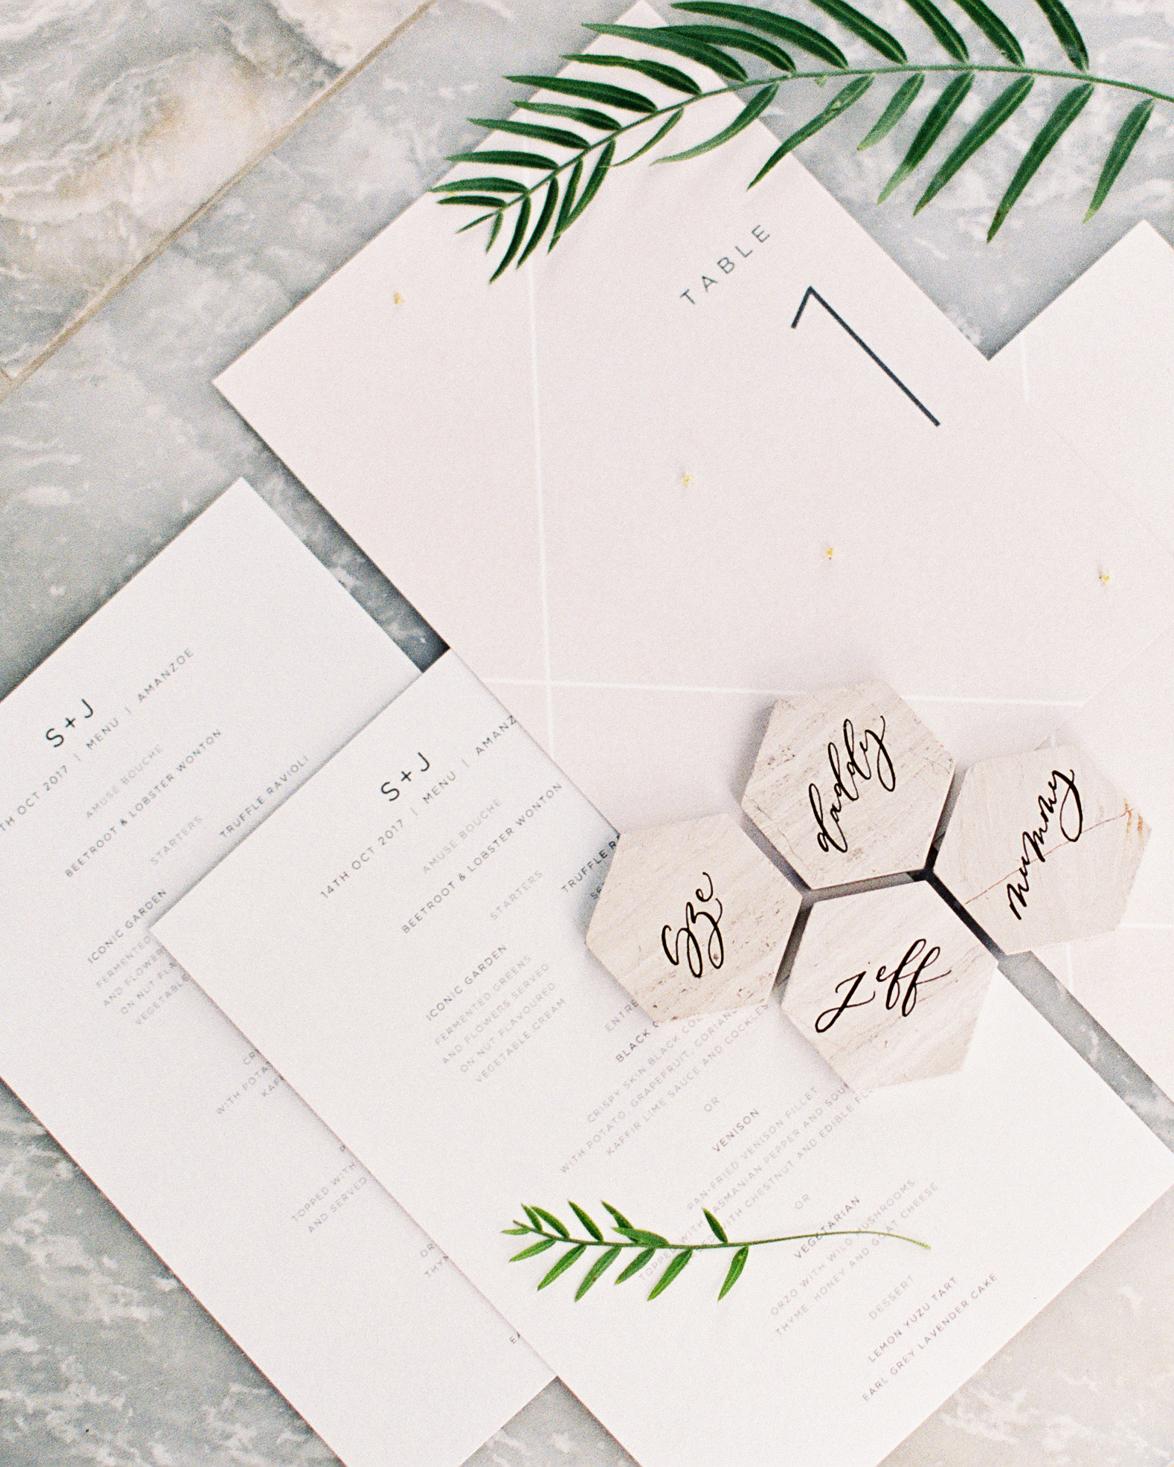 sze amanzoe wedding paper goods greece elegant